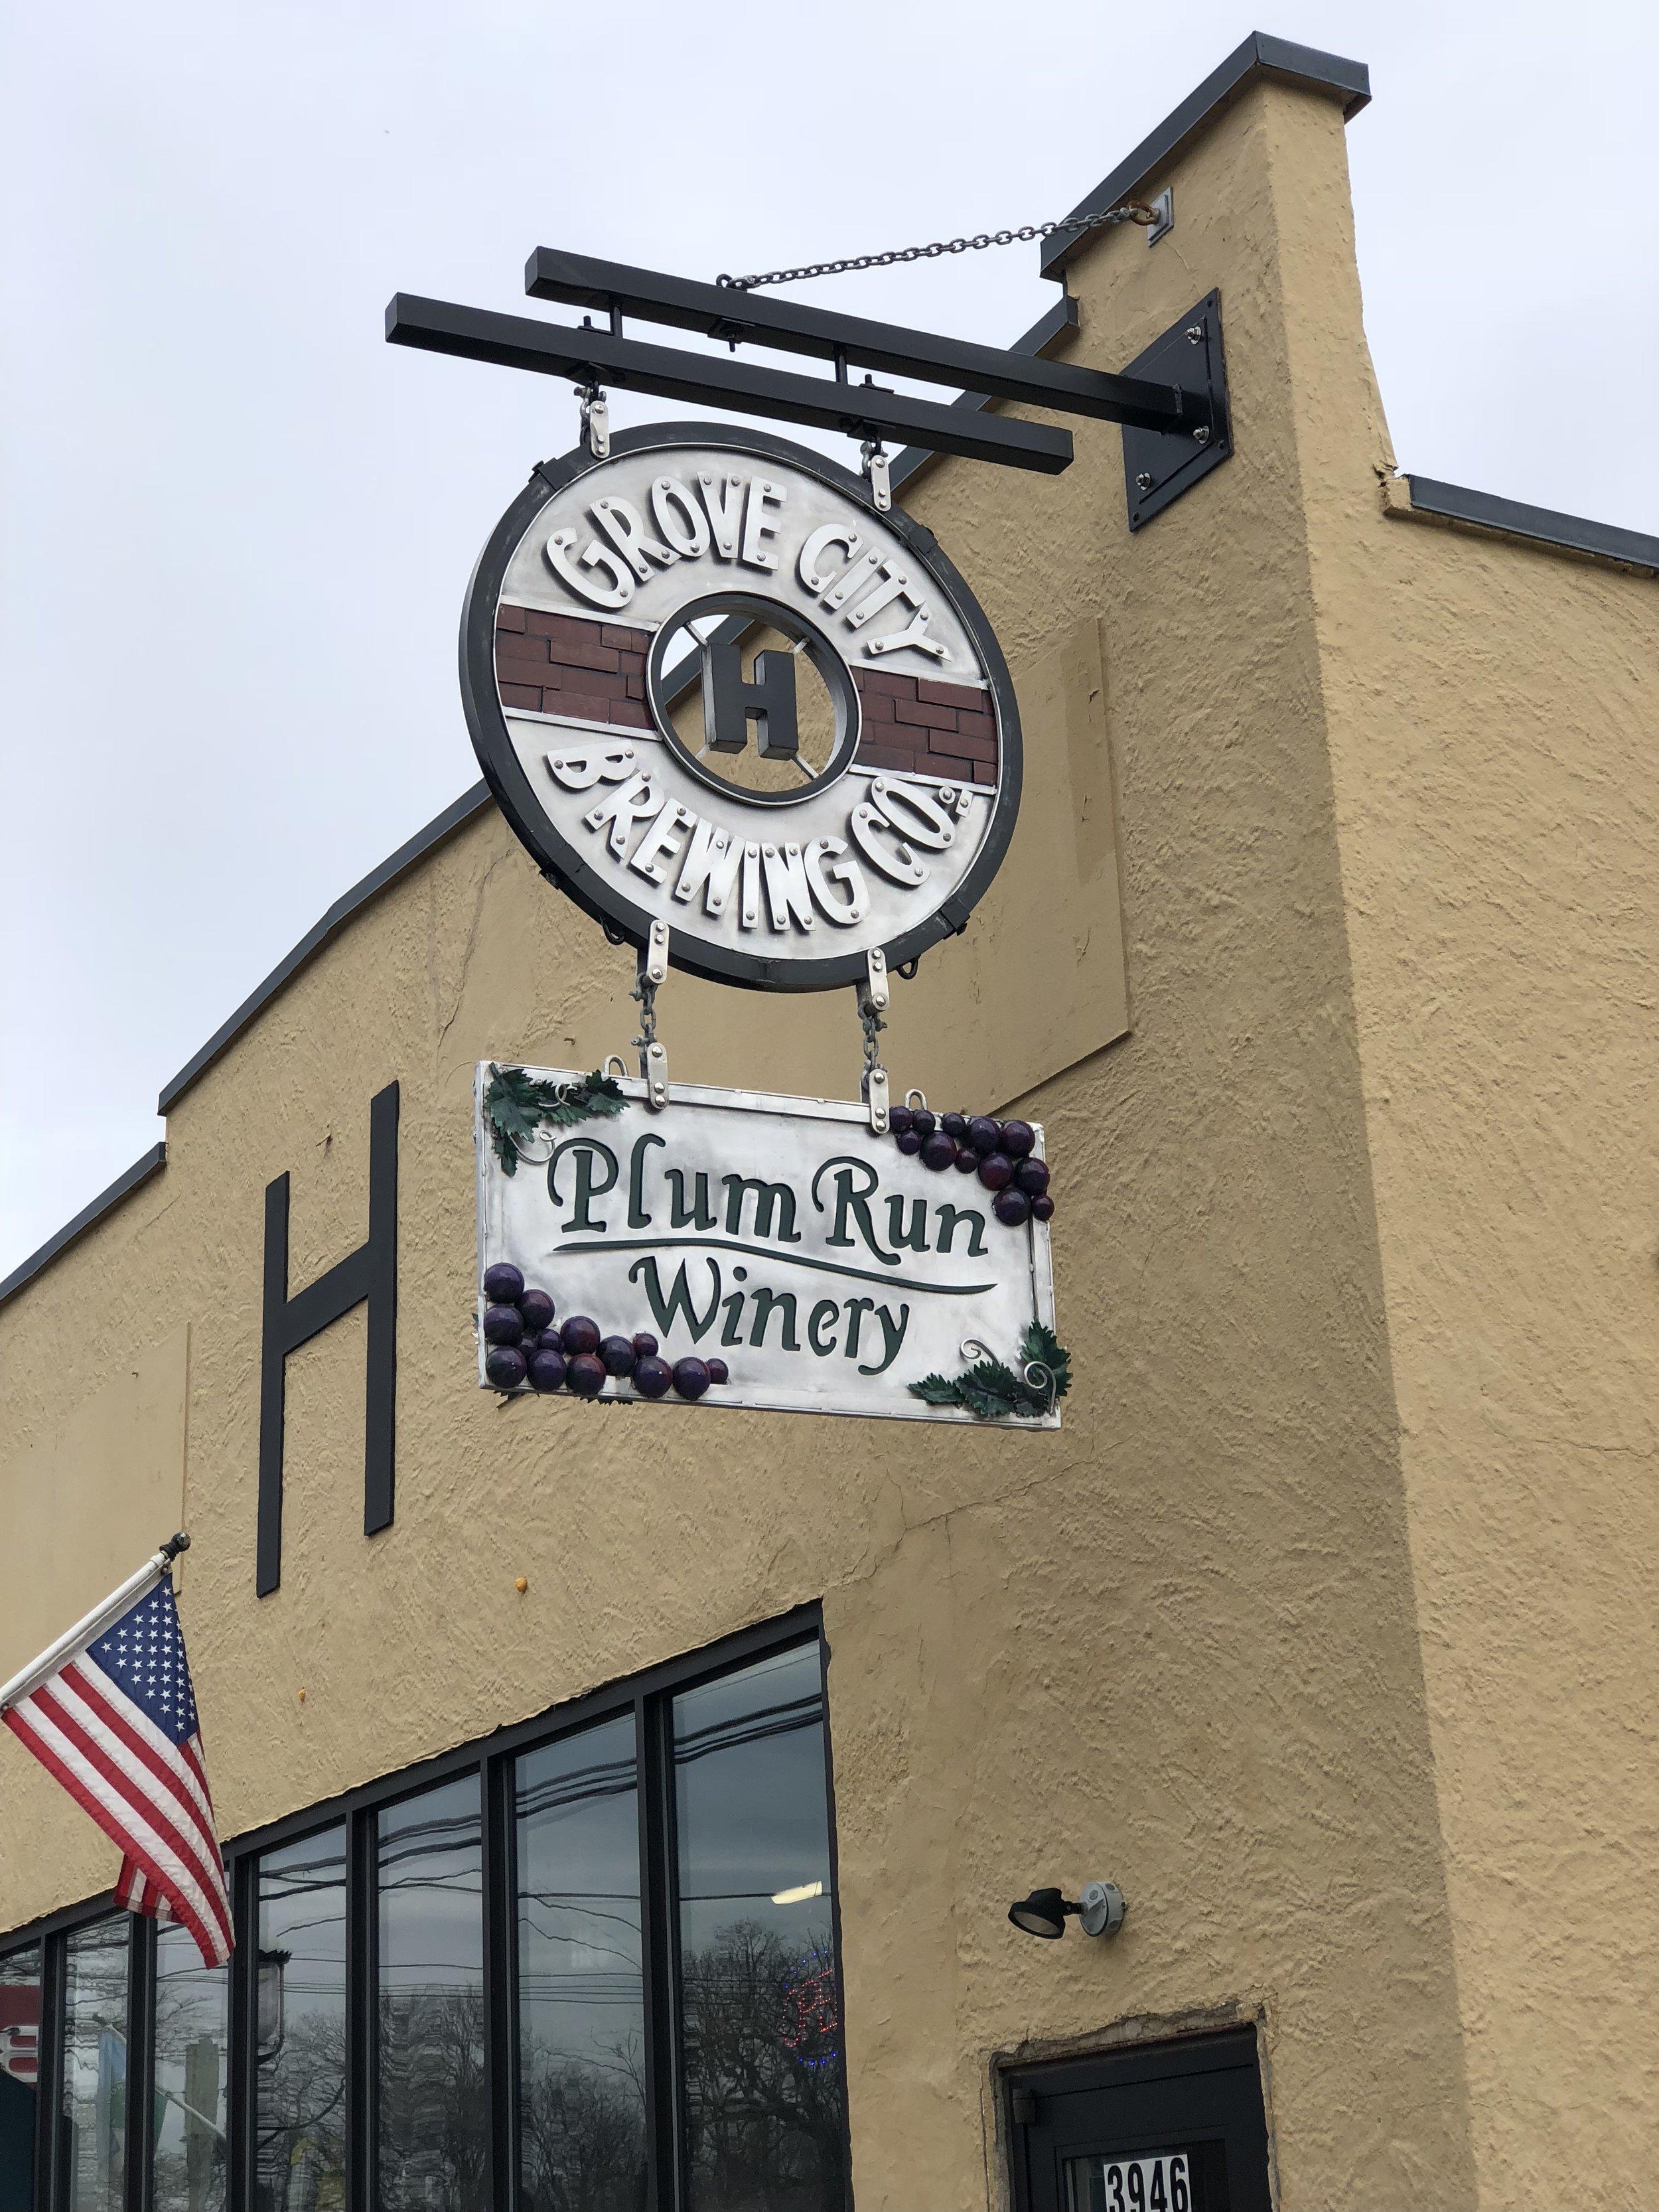 Grove City Brewing Co.